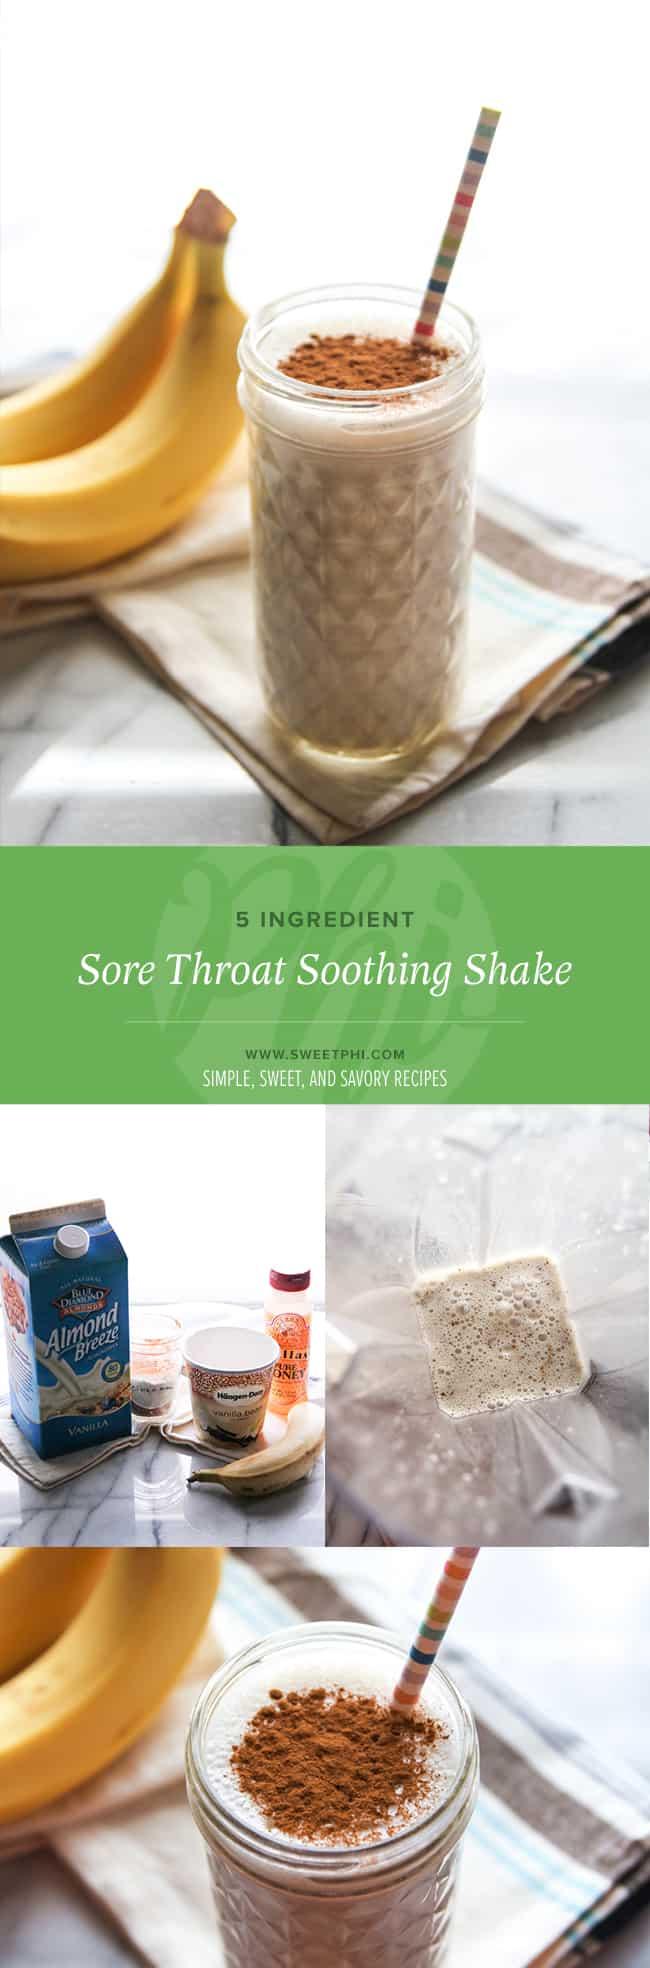 5 ingredient sore throat soothing shake - smoothie from @sweetphi